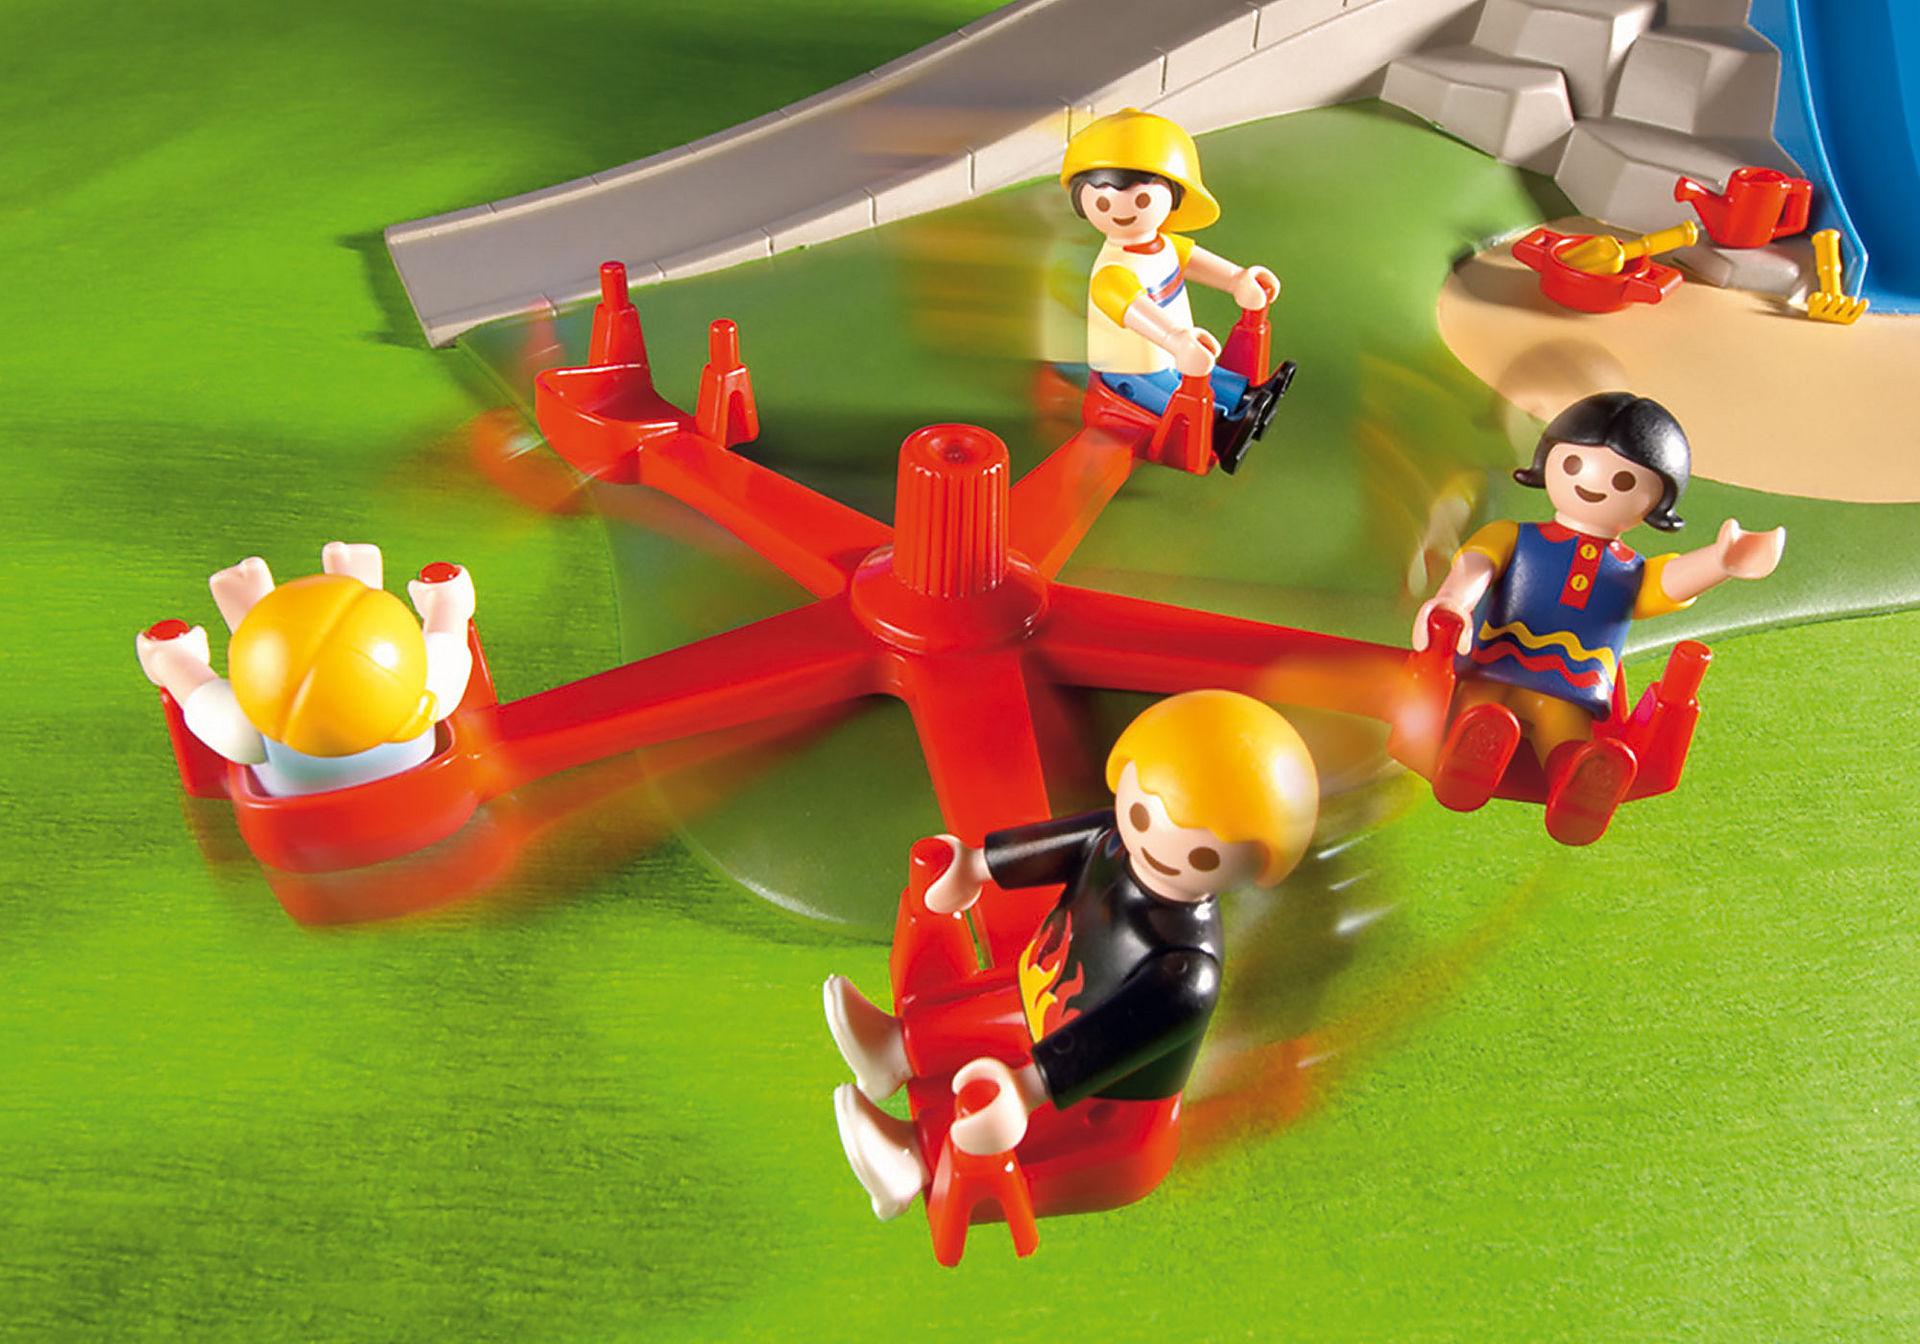 http://media.playmobil.com/i/playmobil/4132_product_extra2/Super Conjunto Infantil